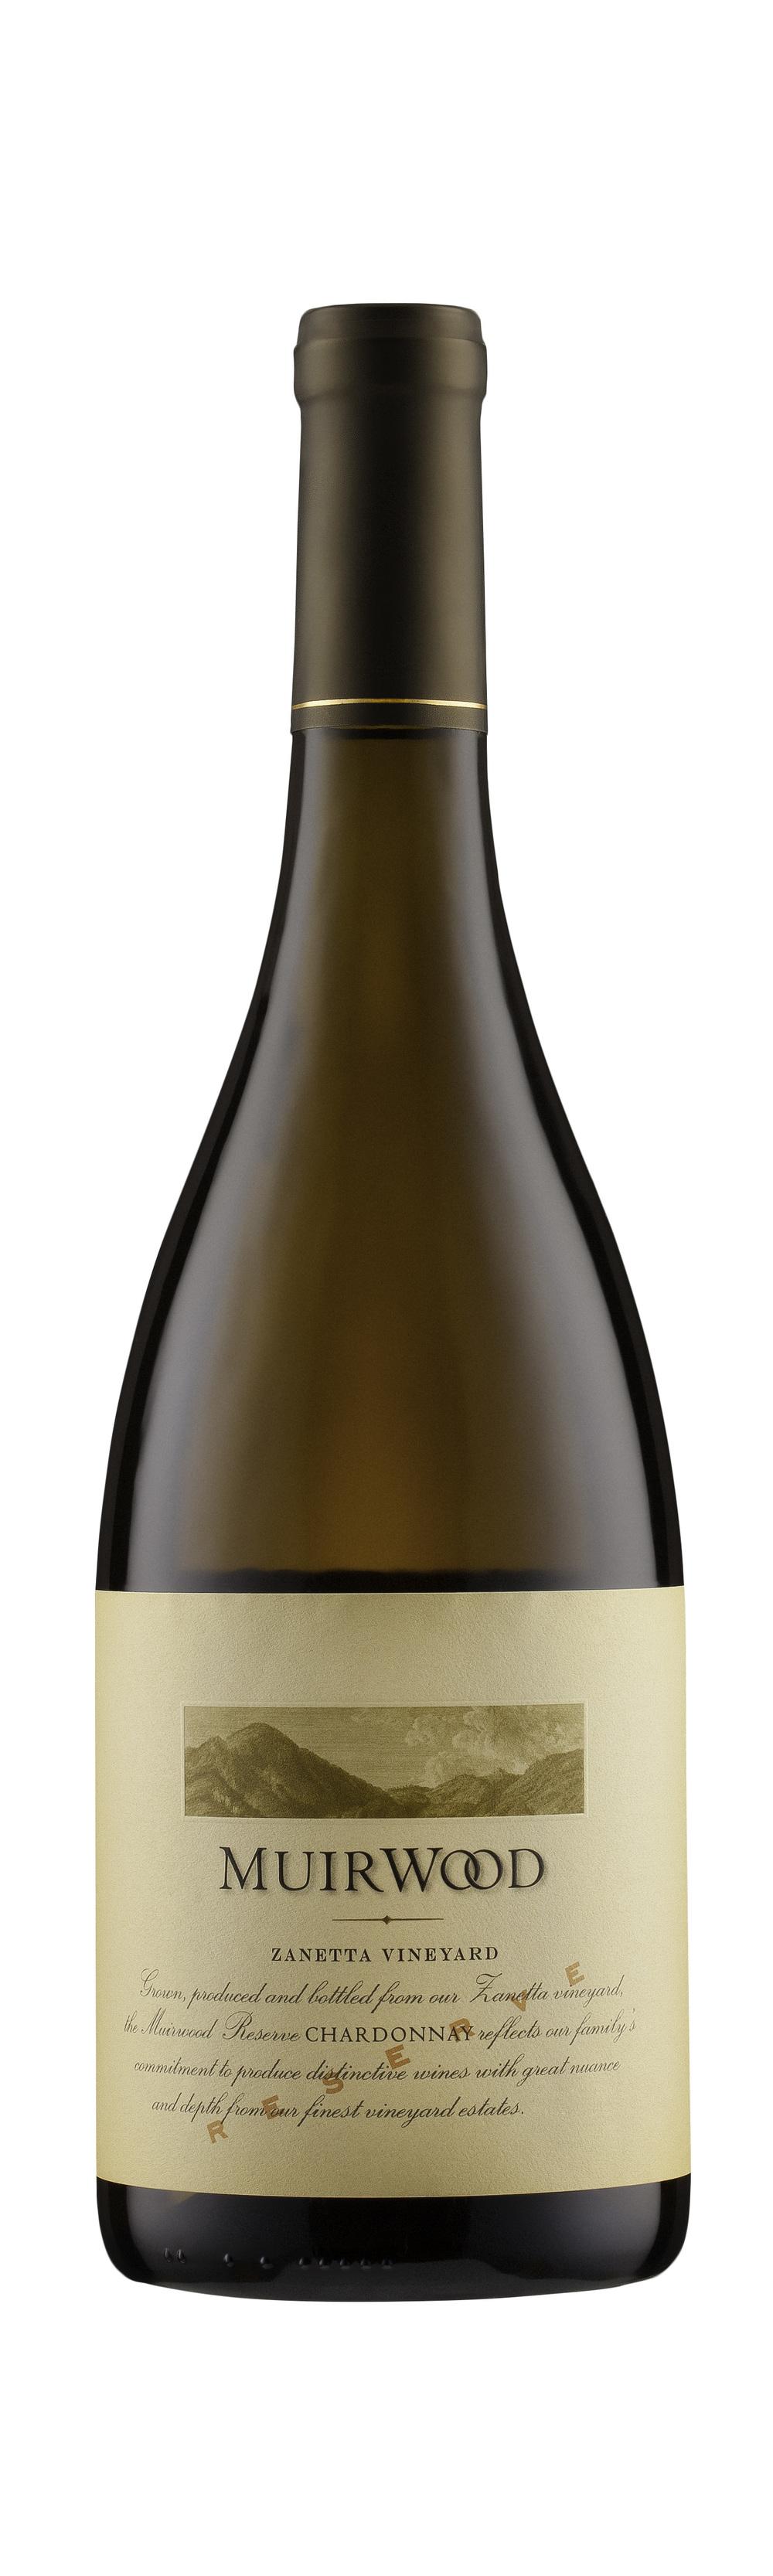 Muirwood Reserve Chardonnay.jpg